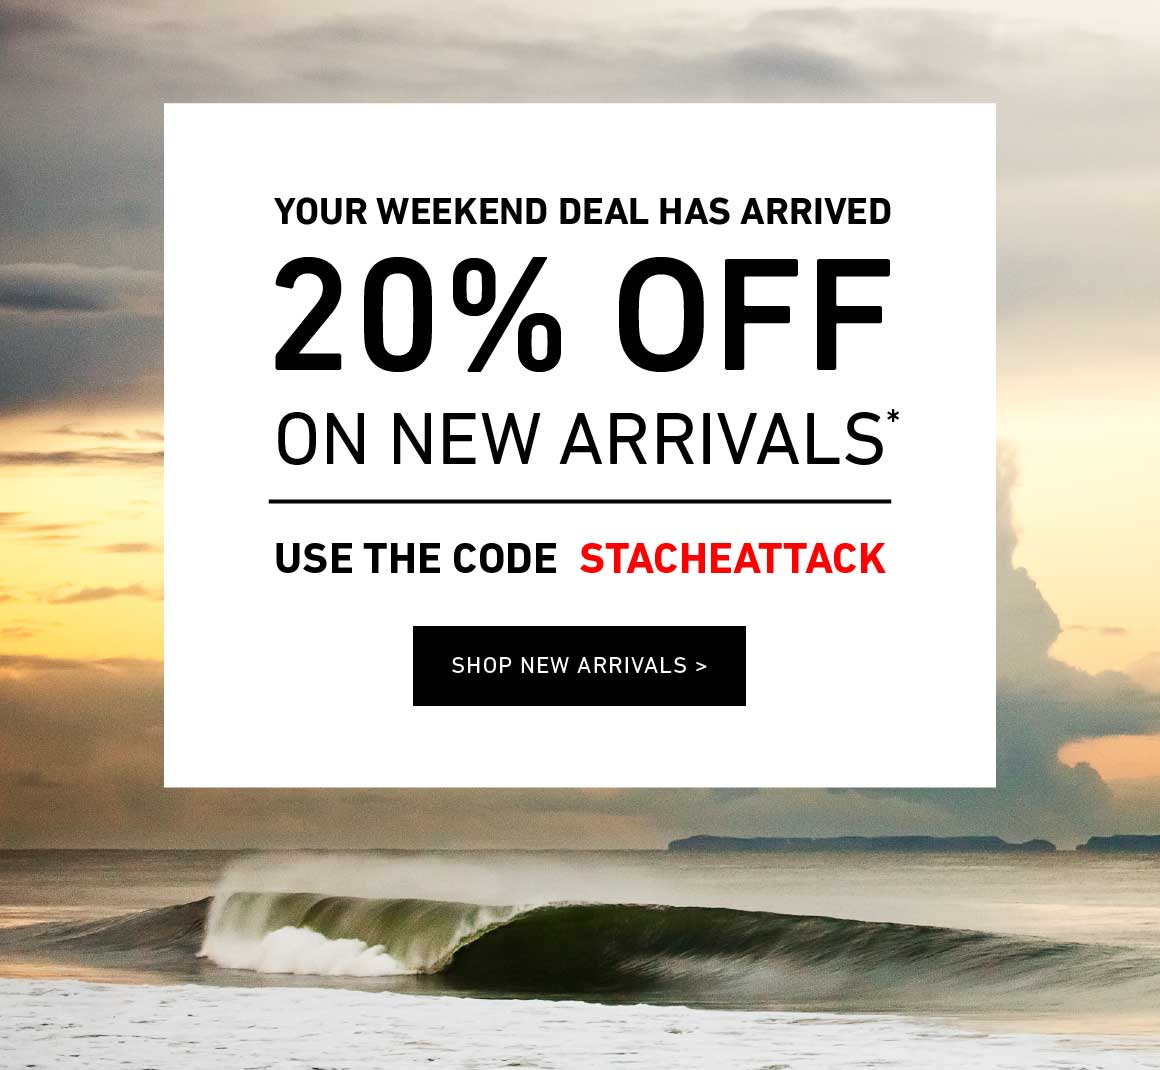 20% Off New Arrivals! Enter Code: STACHEATTACK